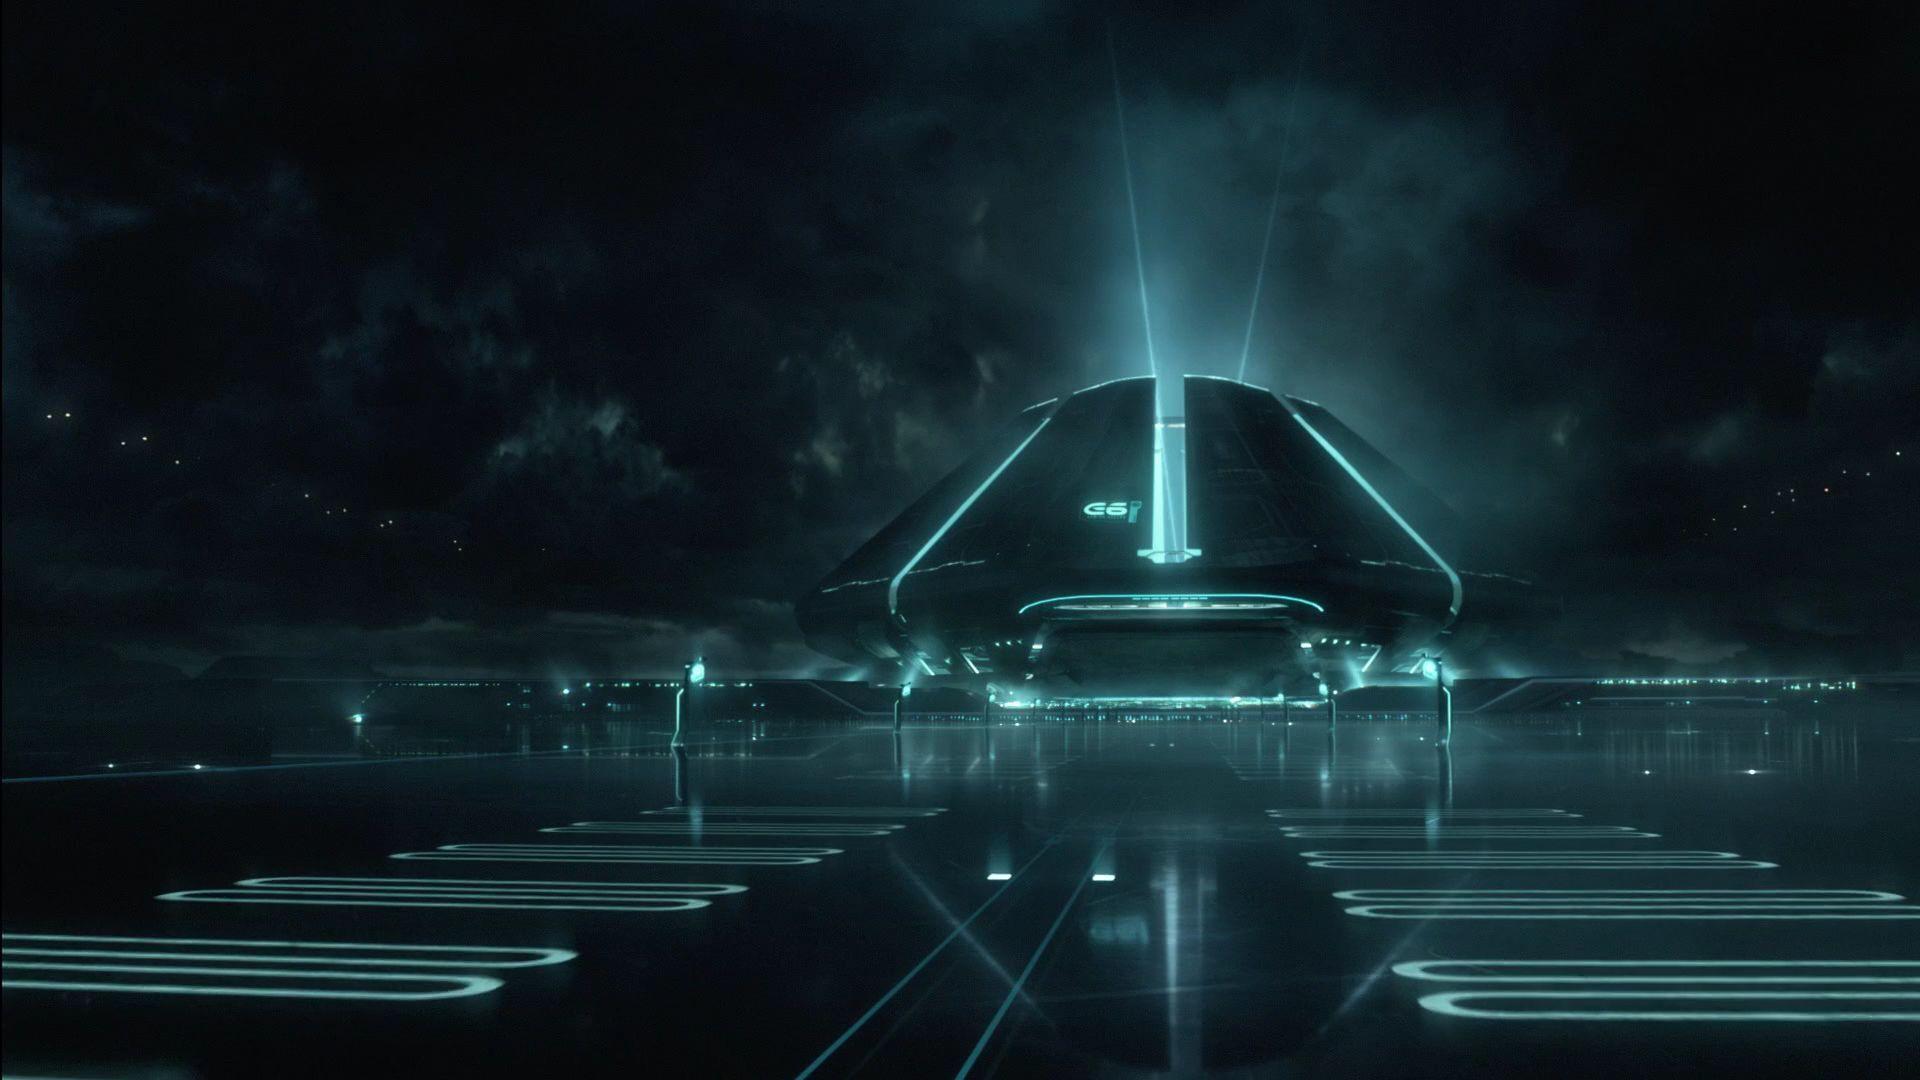 tron legacy - Google Search | Tech/UI/HUD/Hologram | Pinterest